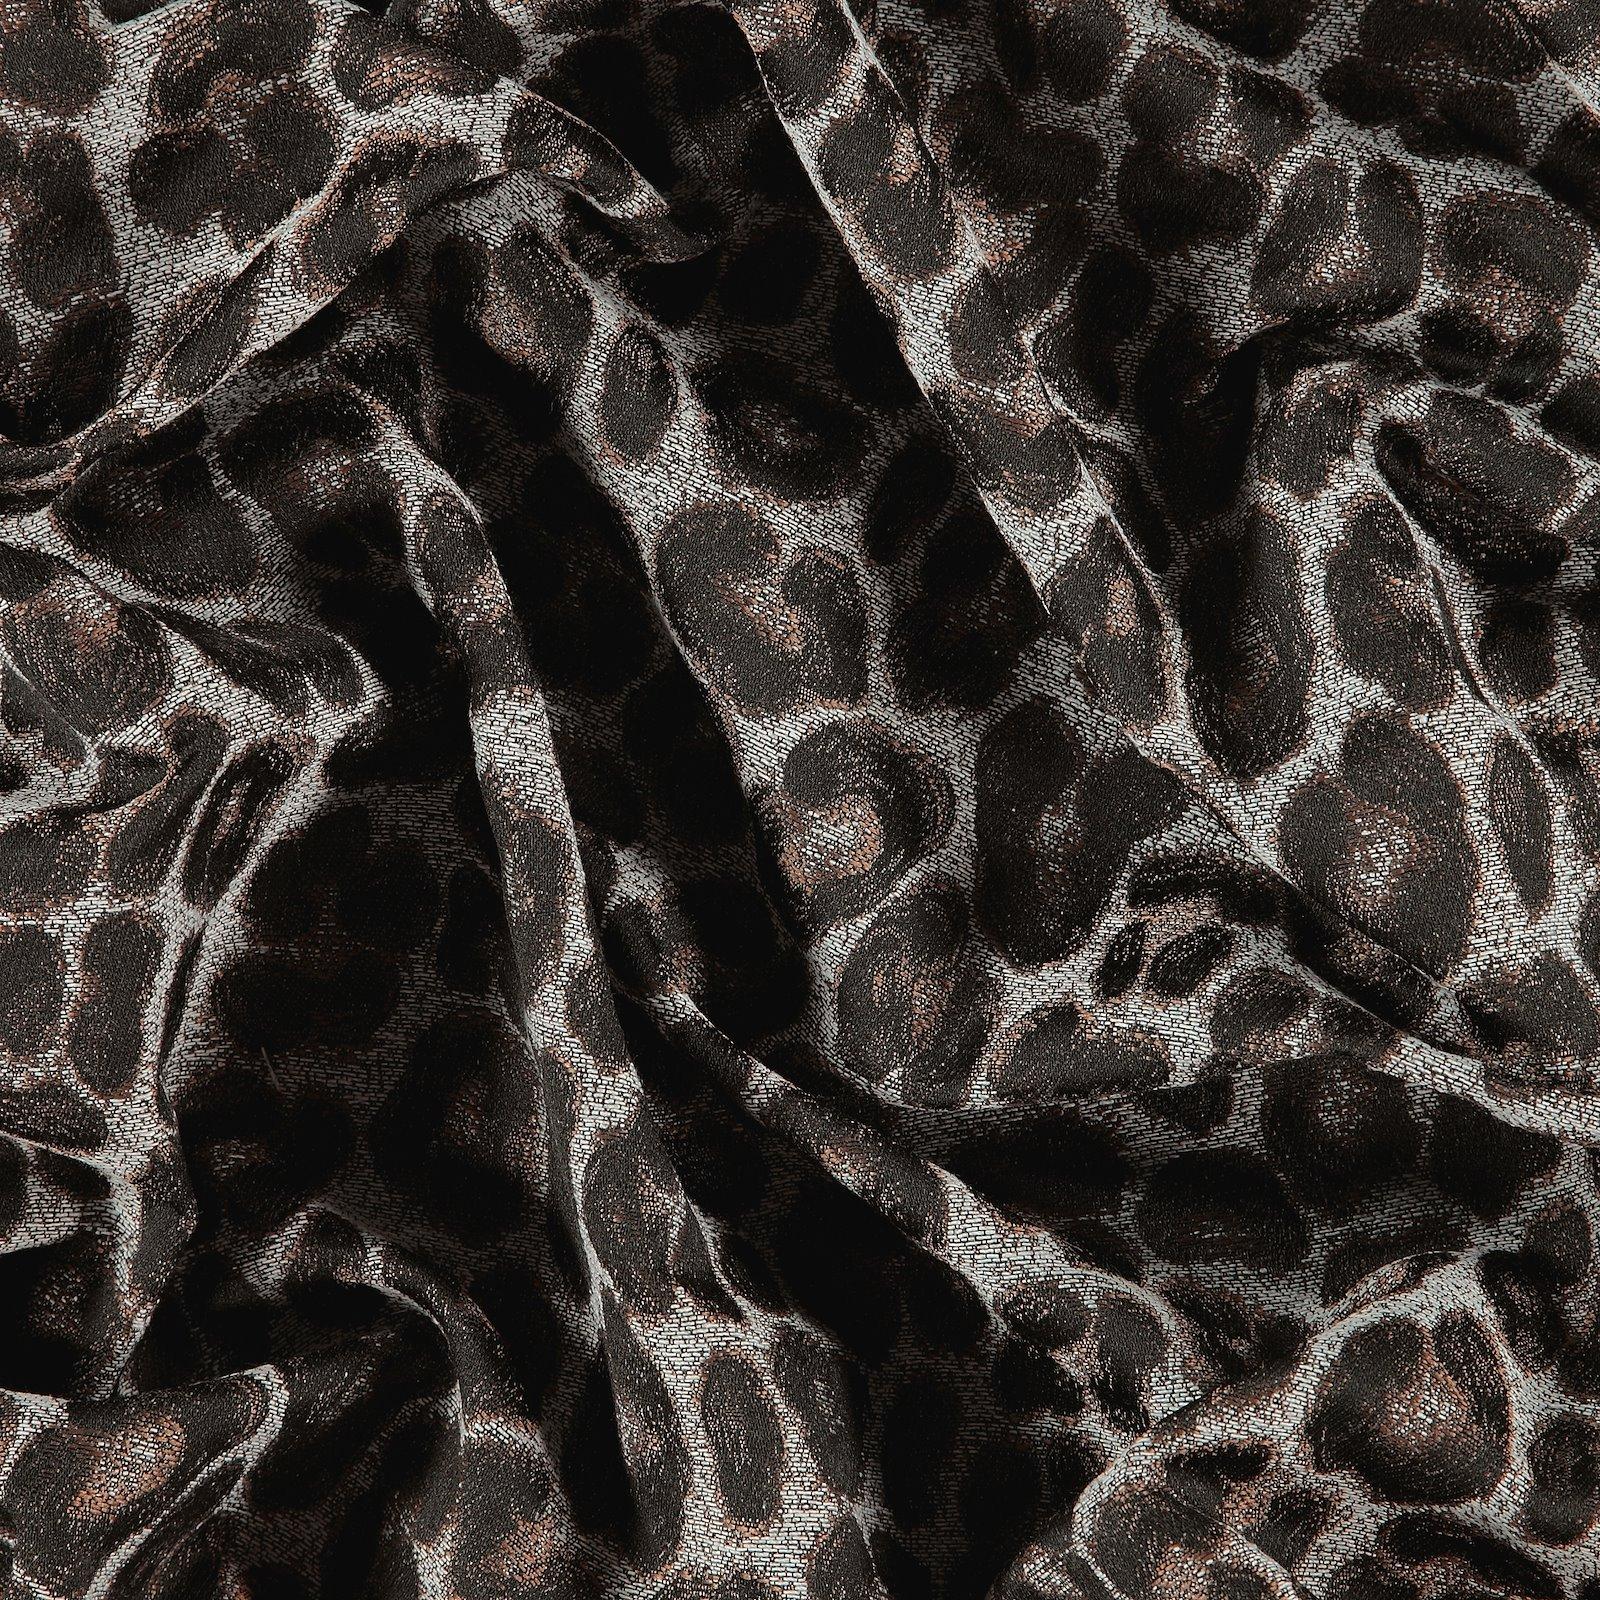 Jacquard grey w black/brown leo pattern